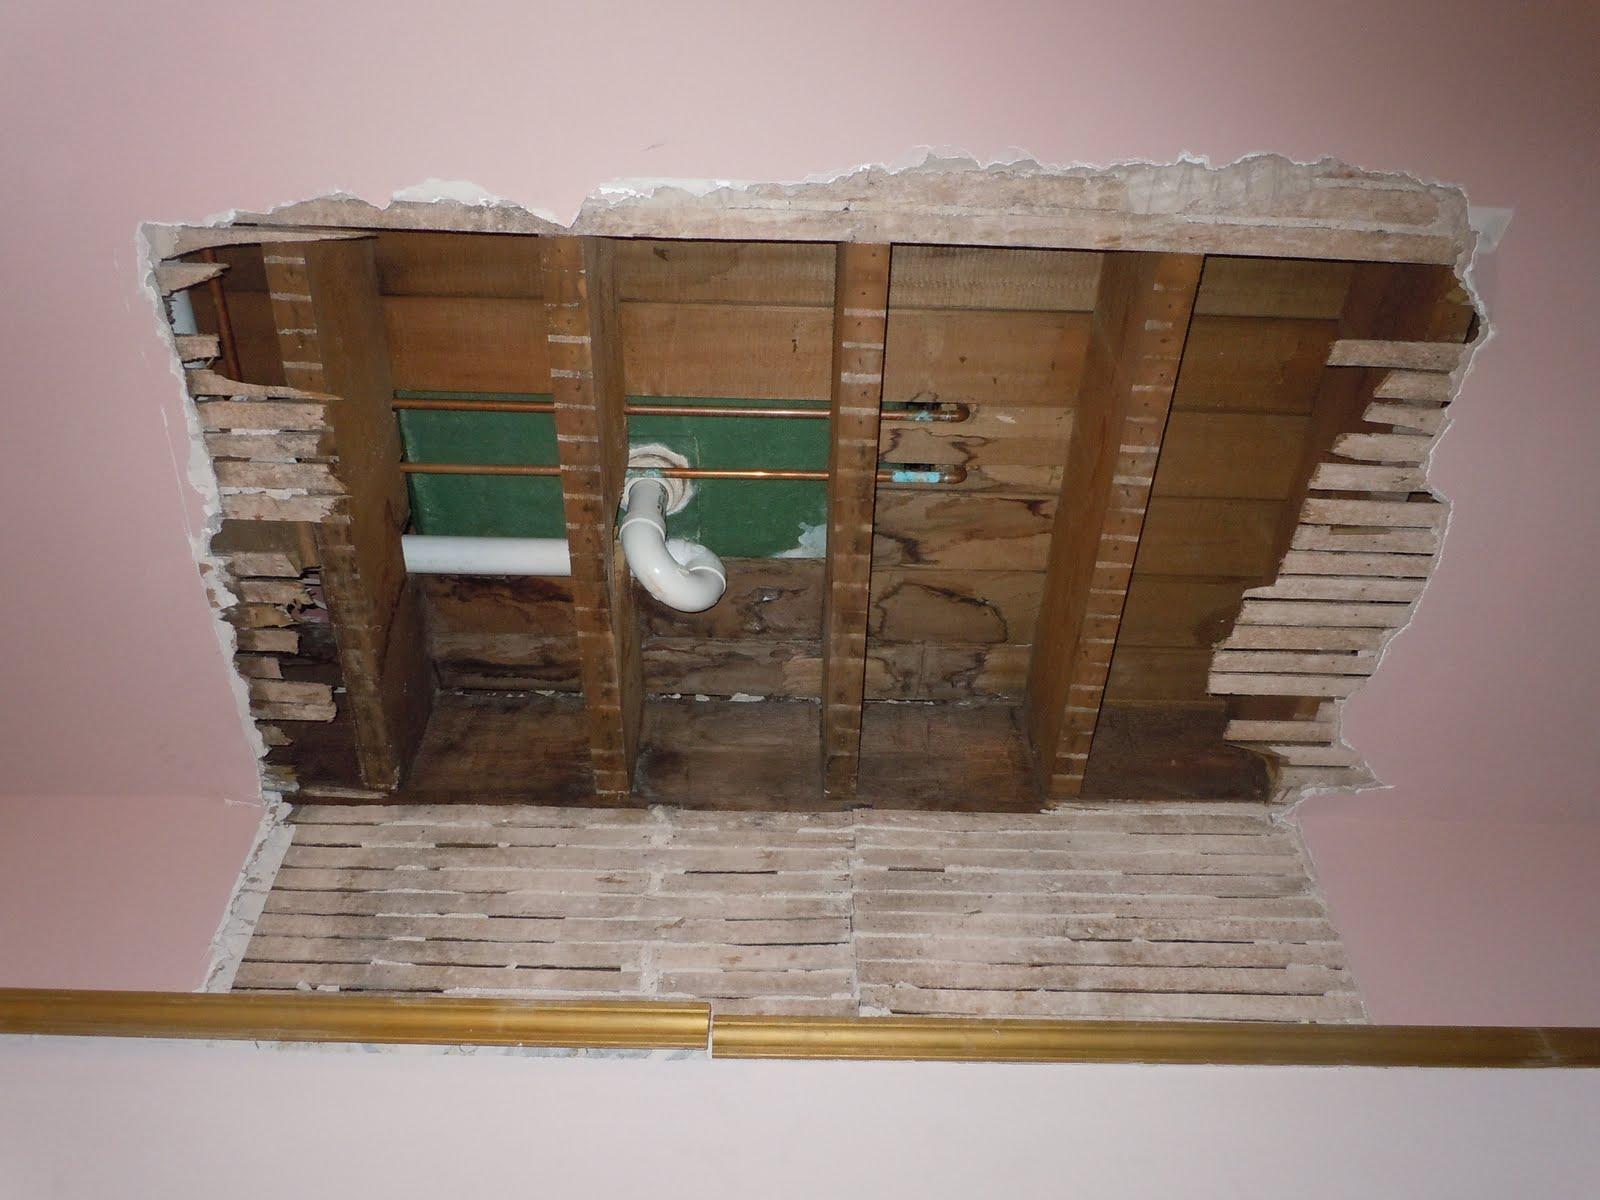 http://1.bp.blogspot.com/-5fv7OwQm1vM/TimavOJS28I/AAAAAAAABZg/tS2kBe8eSM4/s1600/Water+Damage+WI_113.JPG